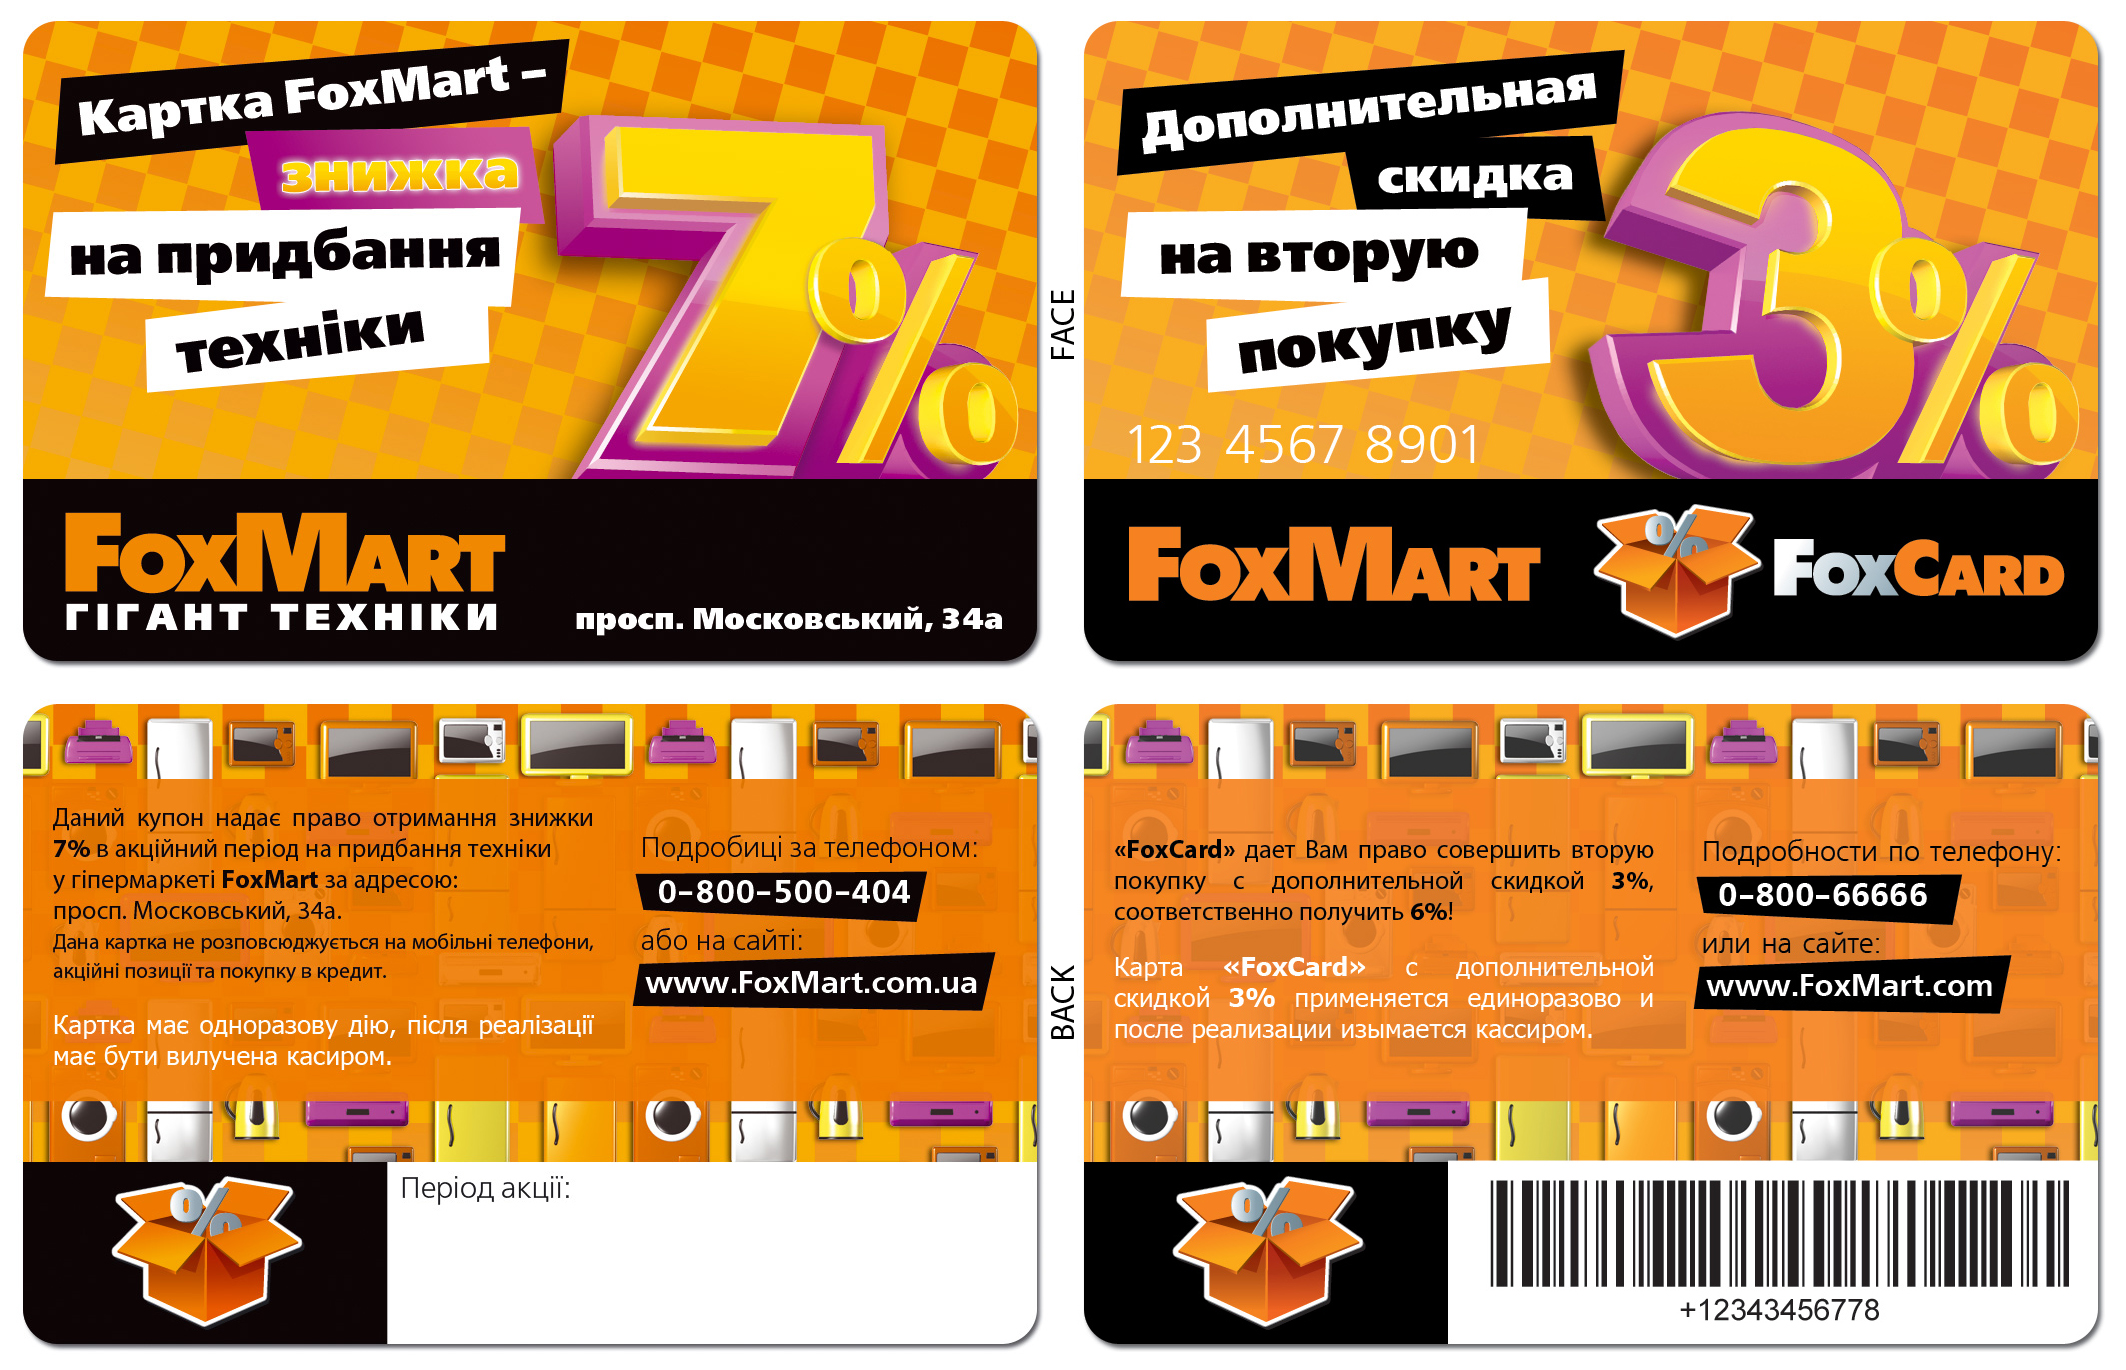 Design of discount card - Foxmart Discount Card Foxmart Discount Card Design Agency Kaffeine Communications Kiev